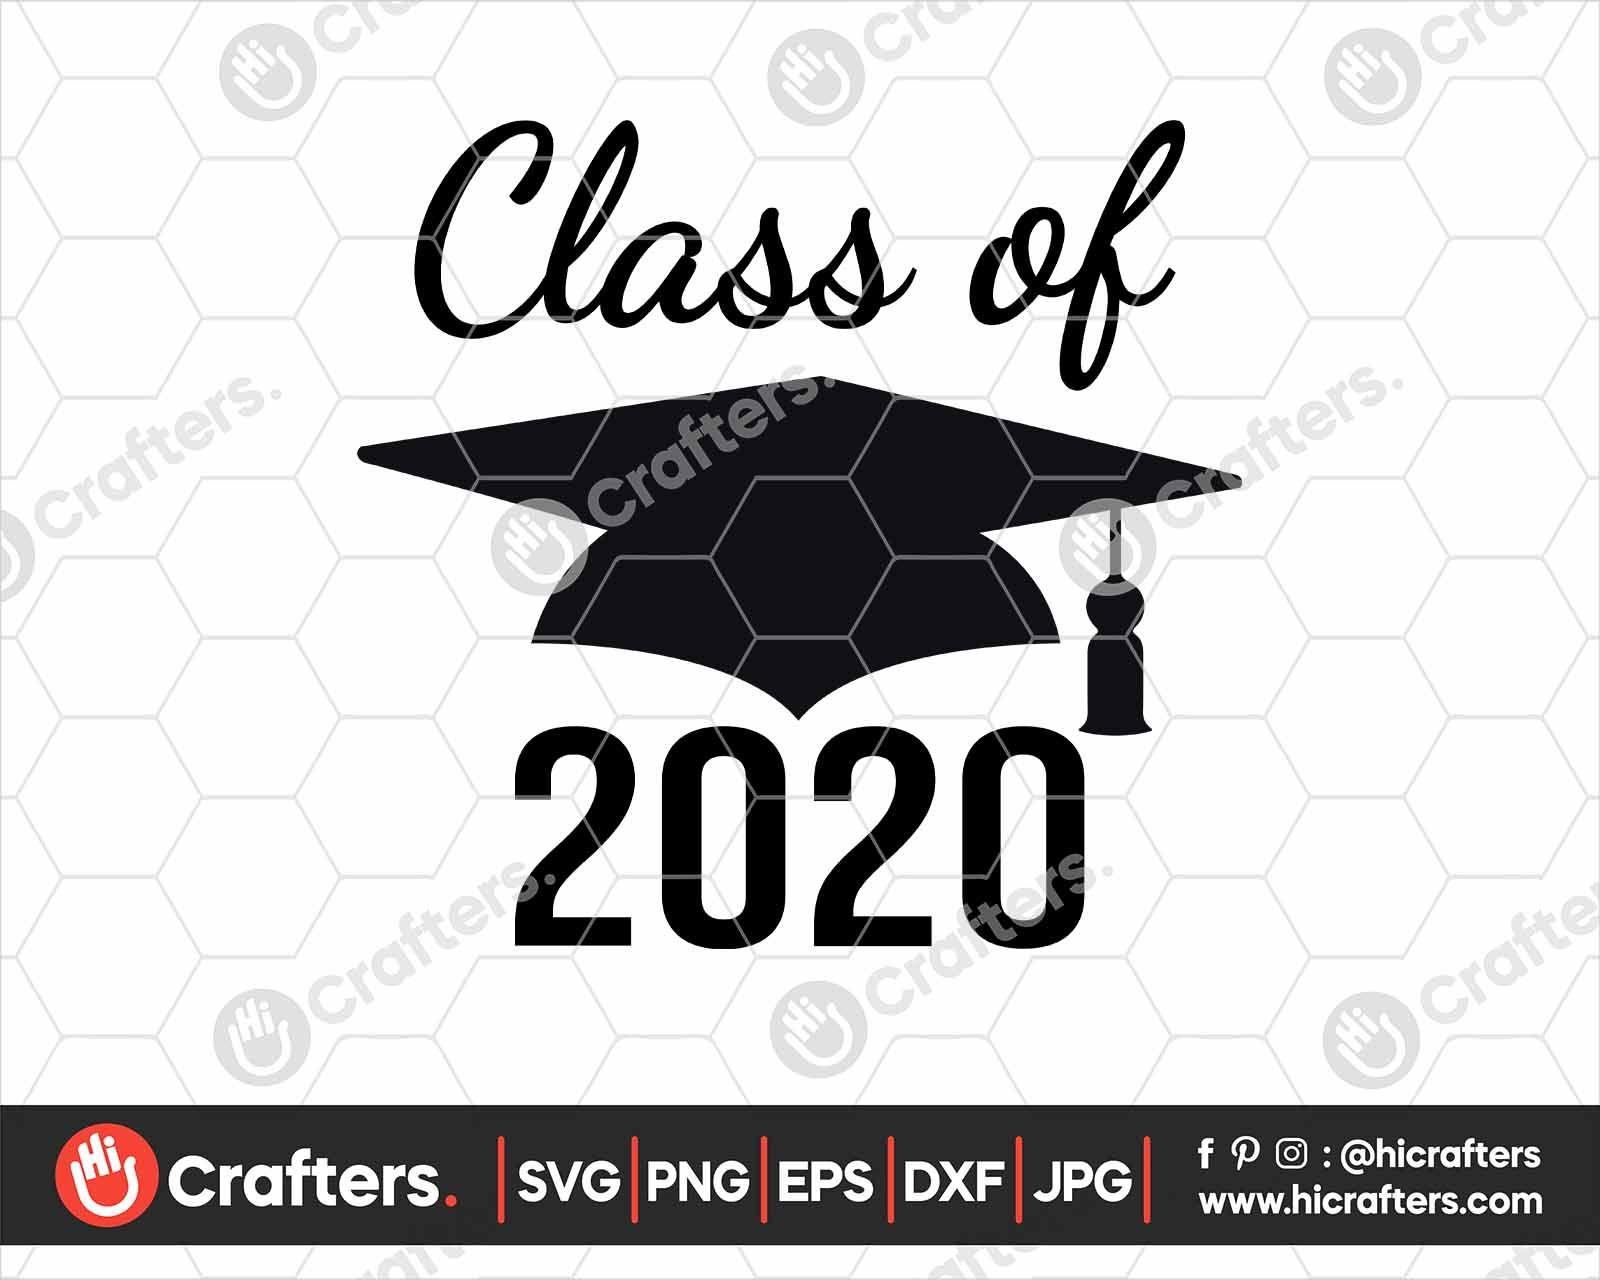 Class Of 2020 SVG, 2020 Graduation SVG PNG Hi Crafters